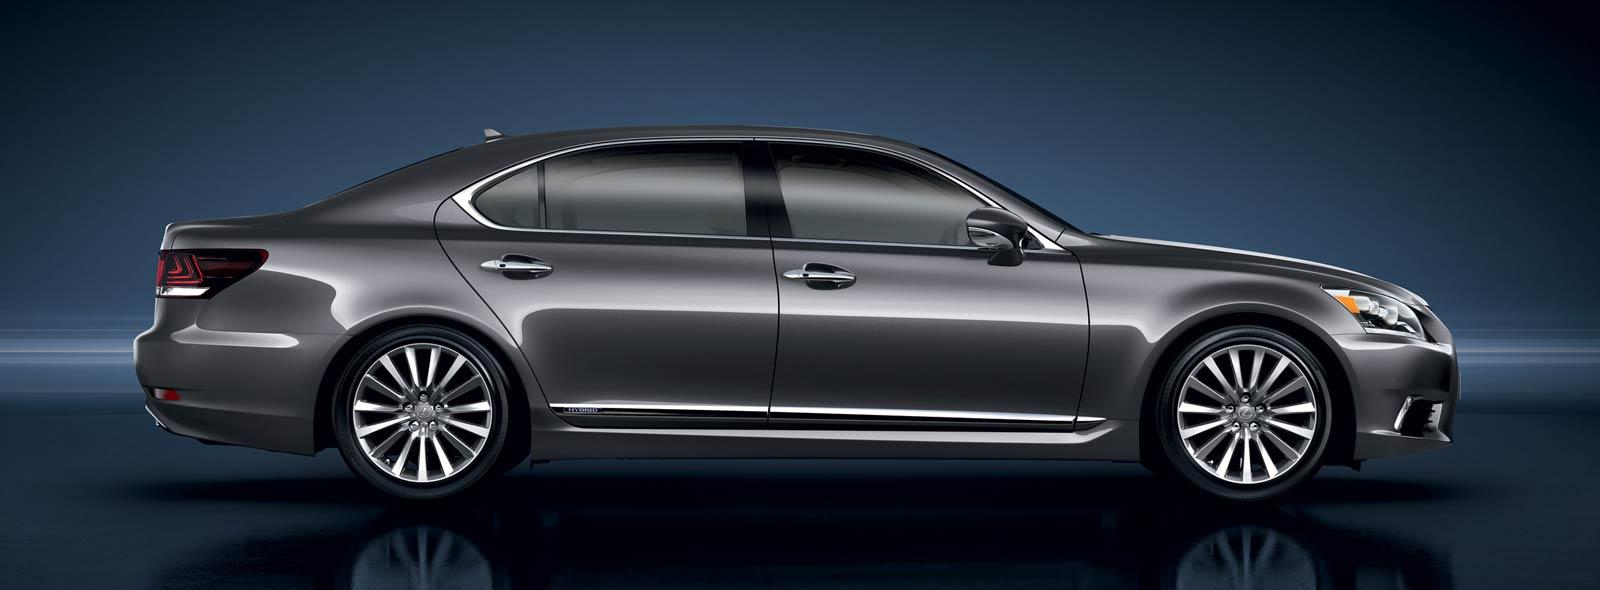 Lexus LS 600h L Hybrid sivusta